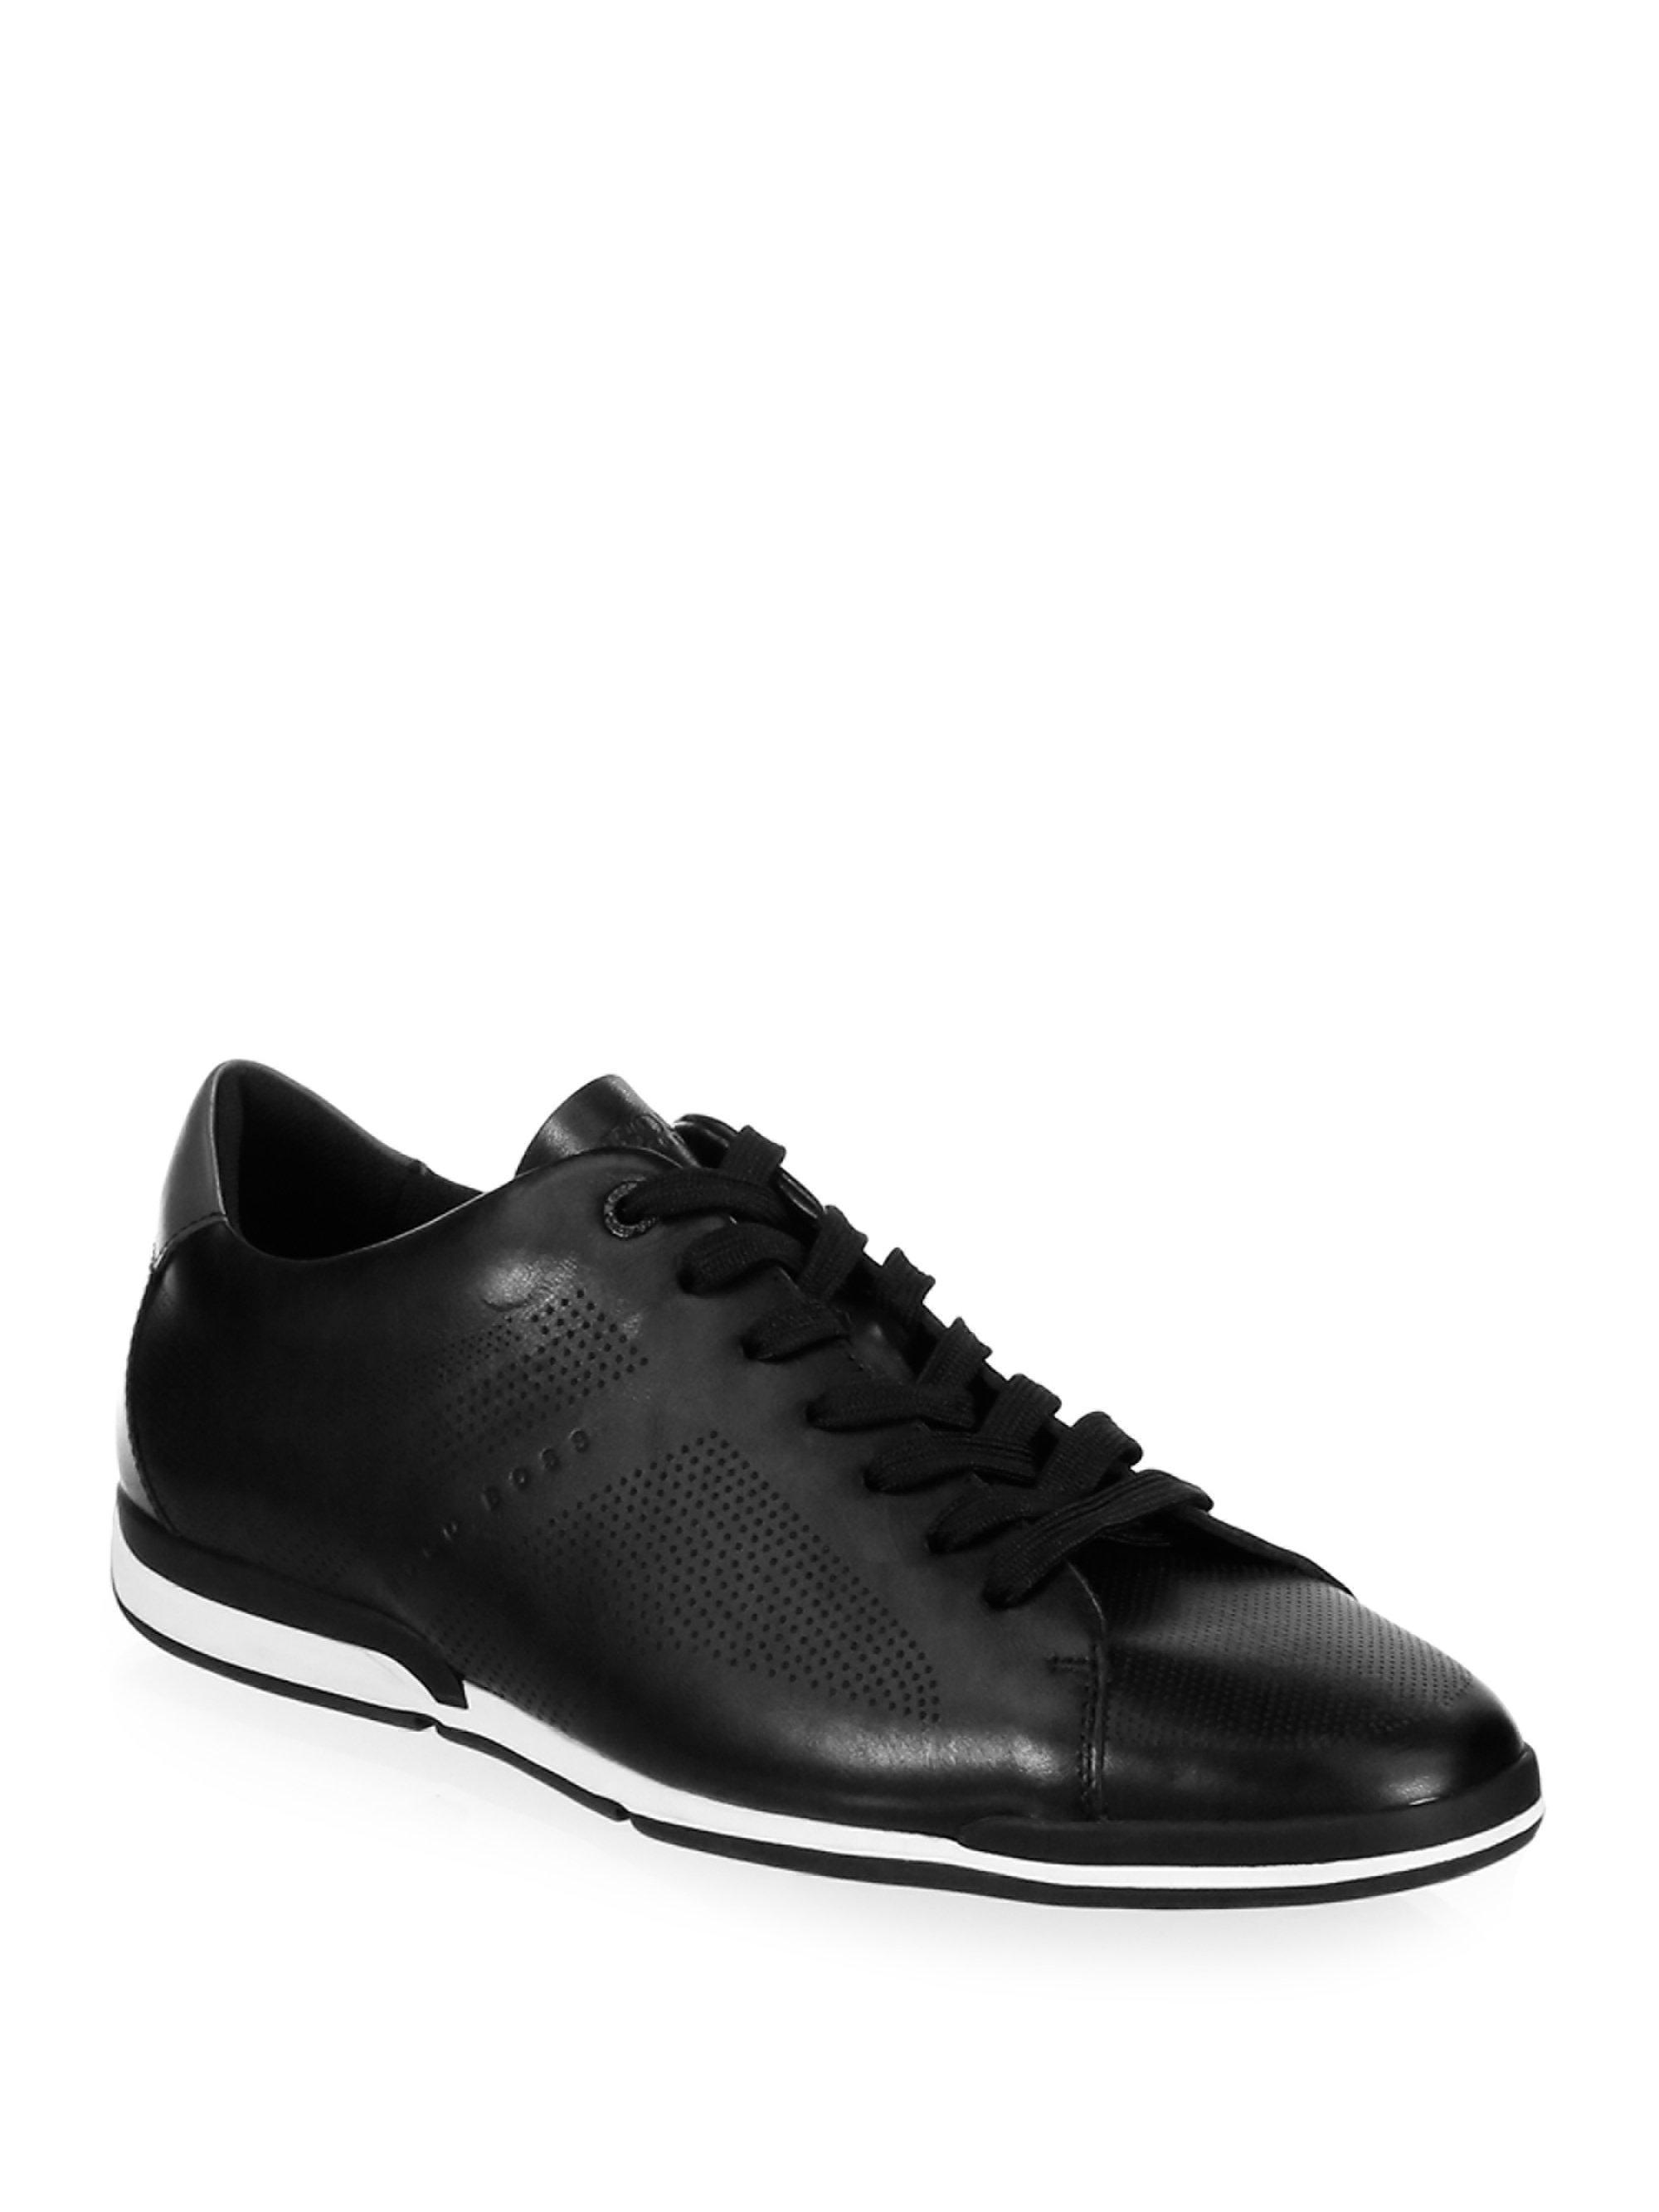 Mens Saturn_Lowp_Act Low-Top Sneakers HUGO BOSS wvf1bw92V